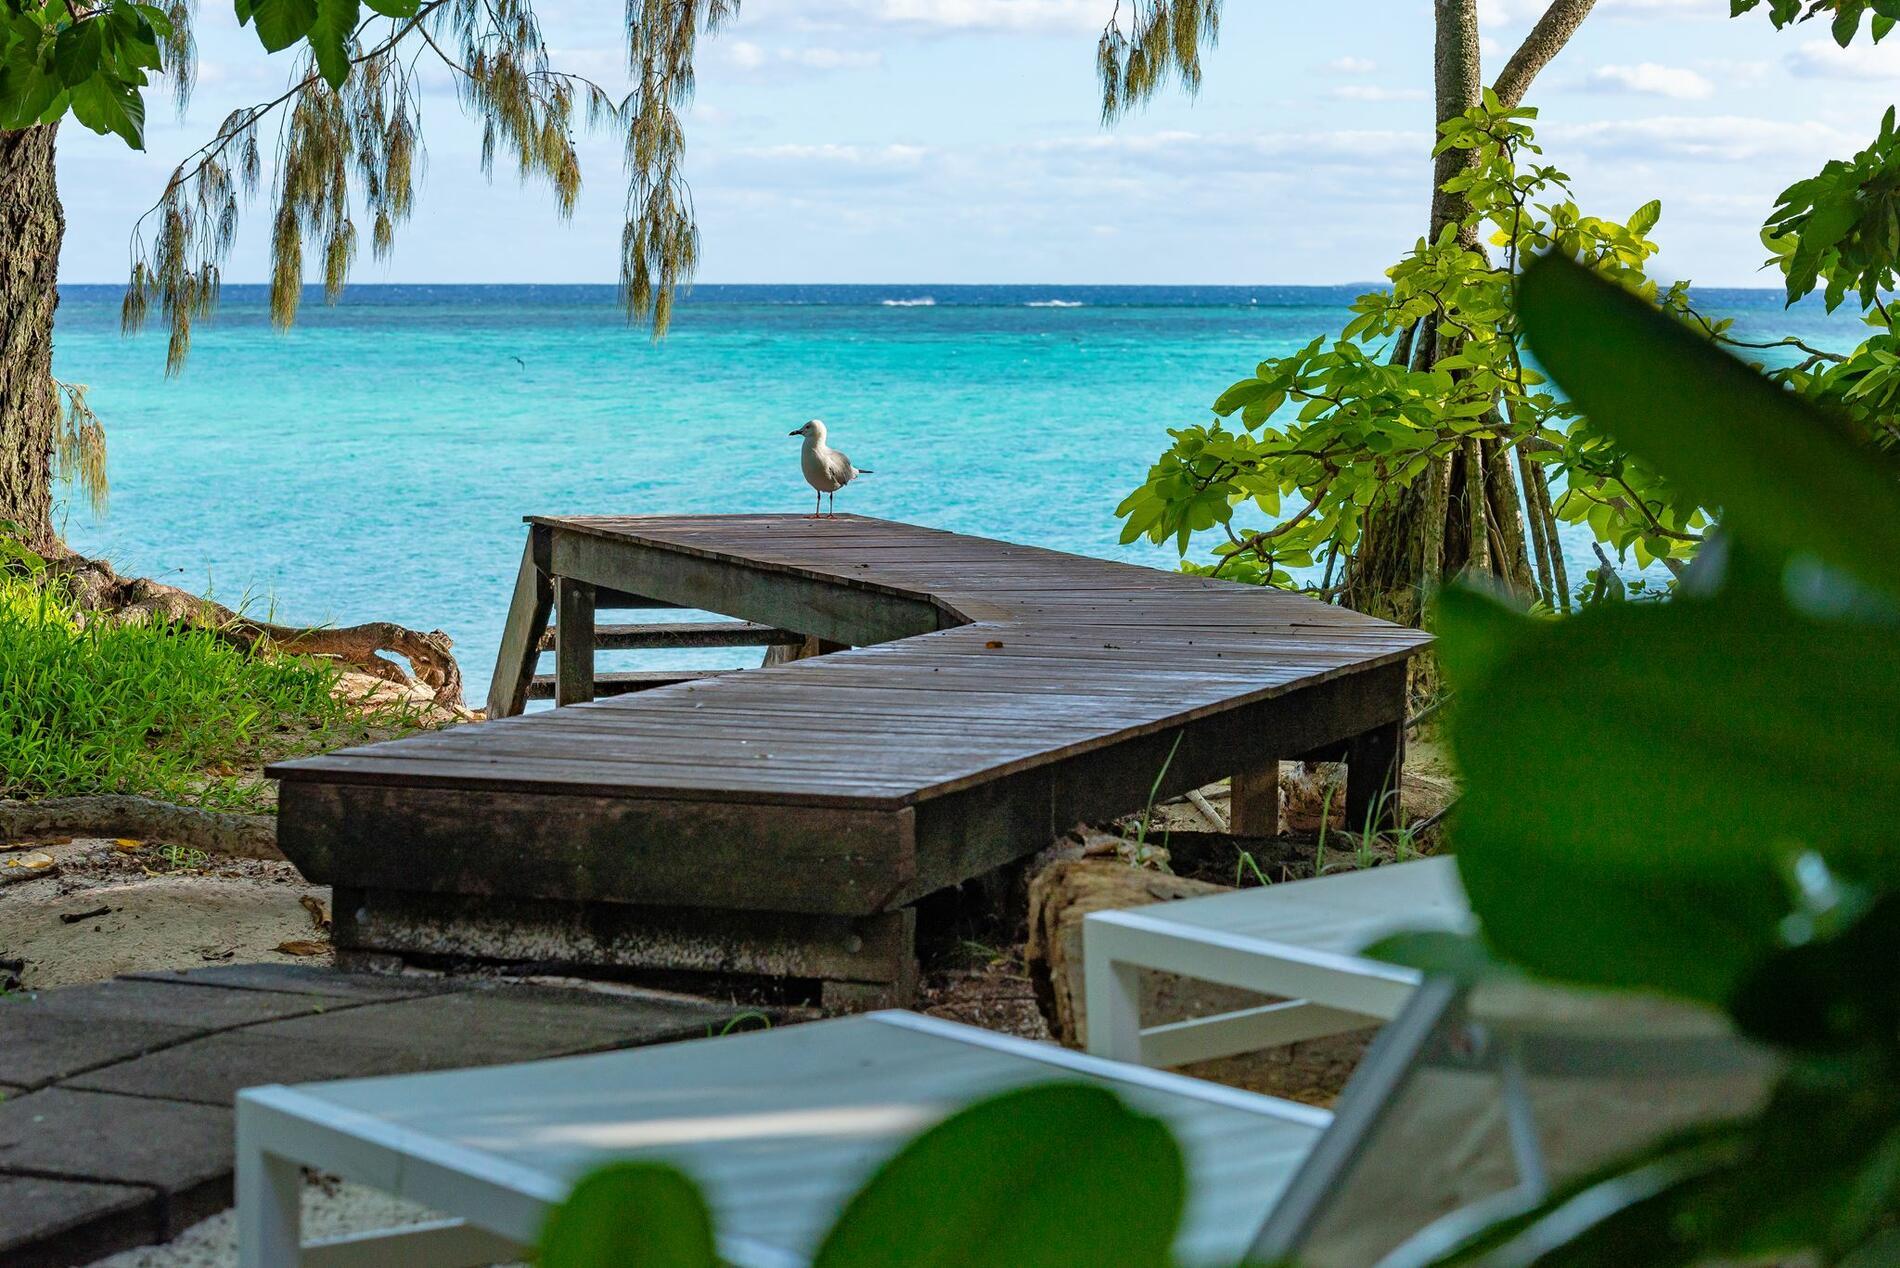 View from the Beach House Heron Island Resort